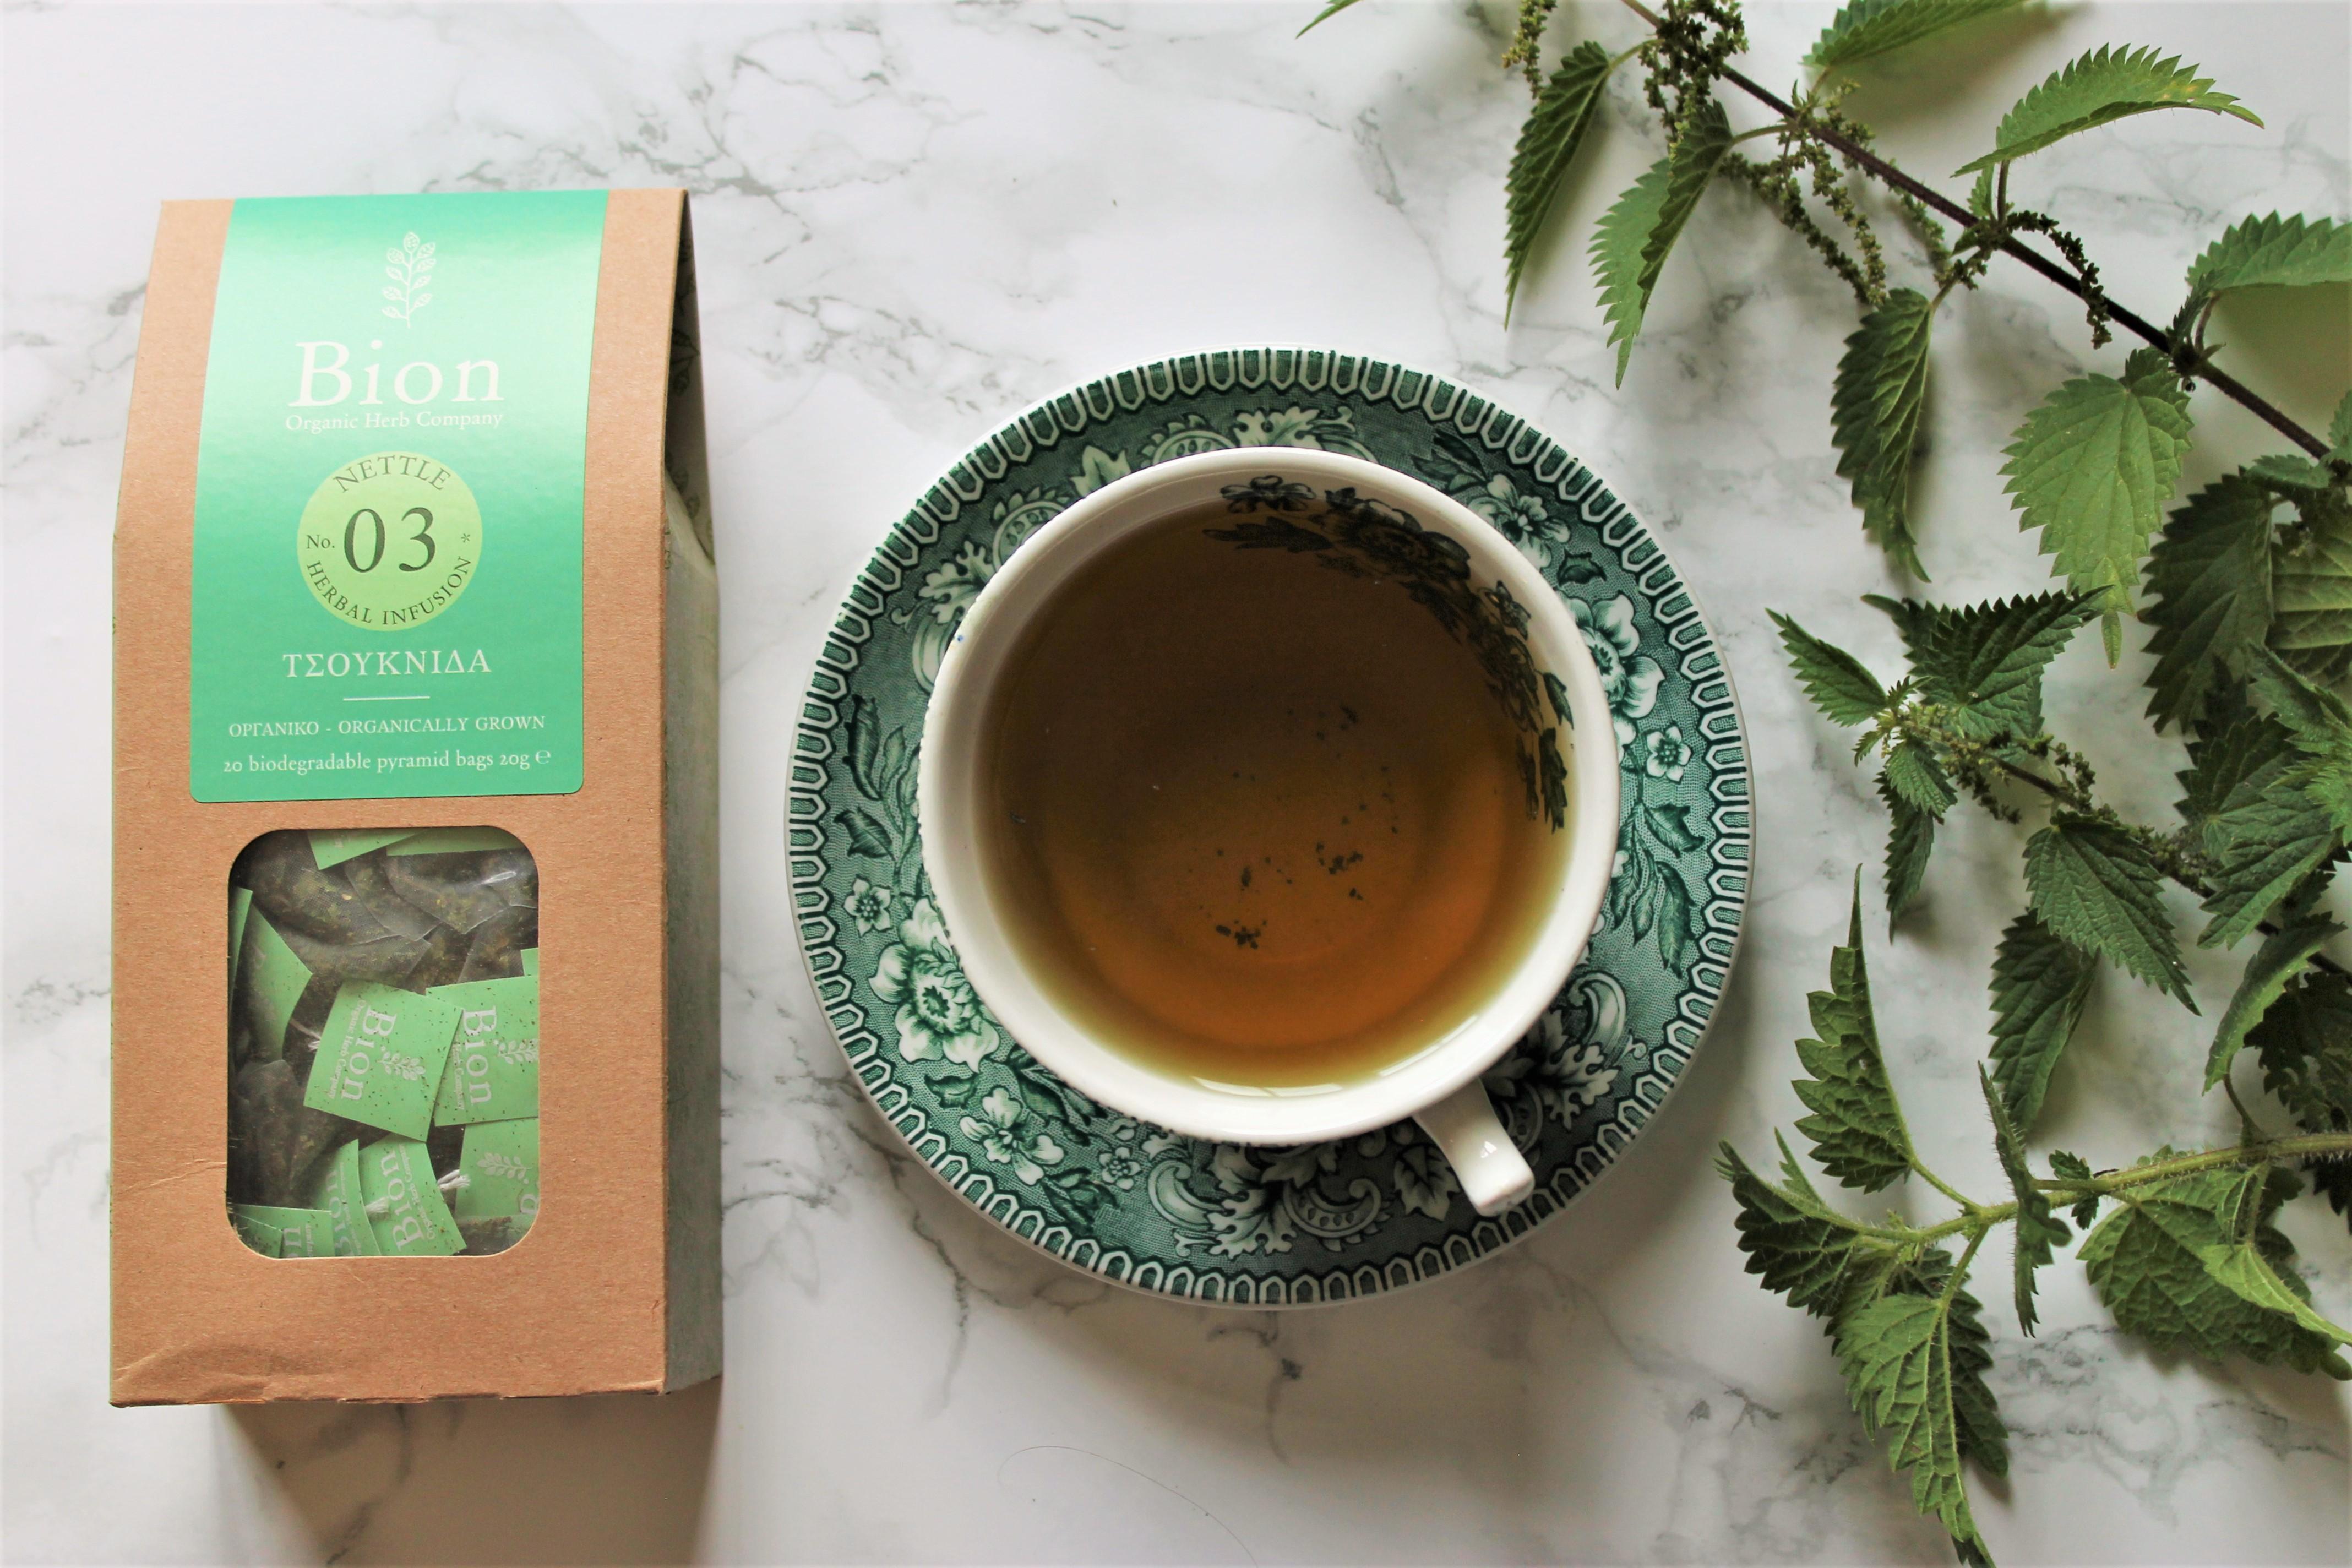 Bion Nettle Tea Review